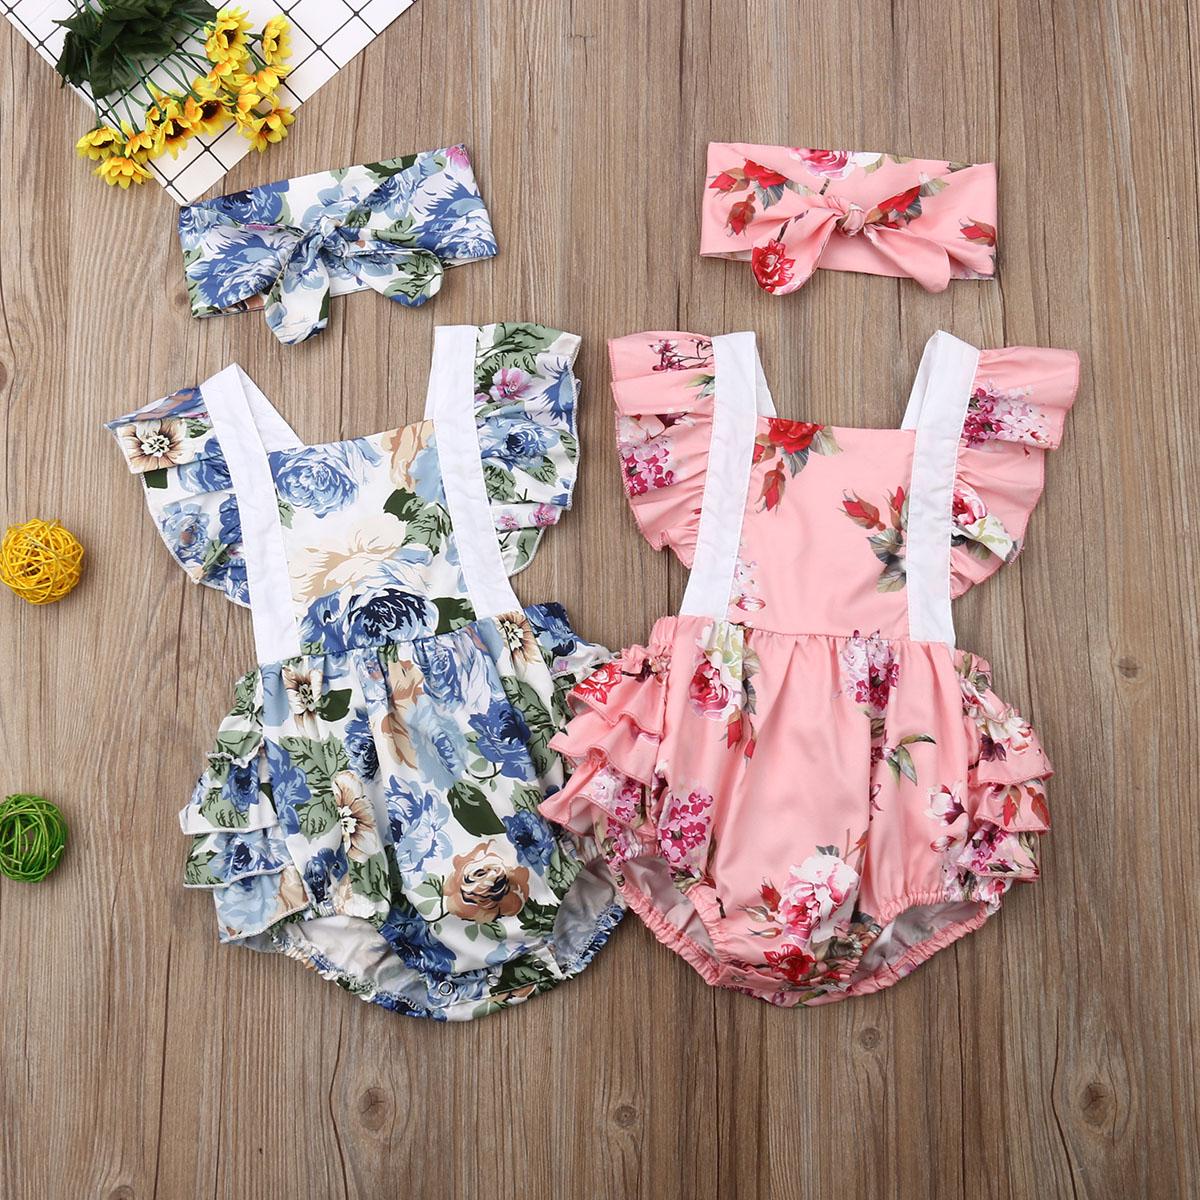 Newborn Cute Baby Bodysuit 2019 Kids Floral Babygrow Summer Clothes Outfit Infant Girl Bodysuit Jumpsuit + Headband Set